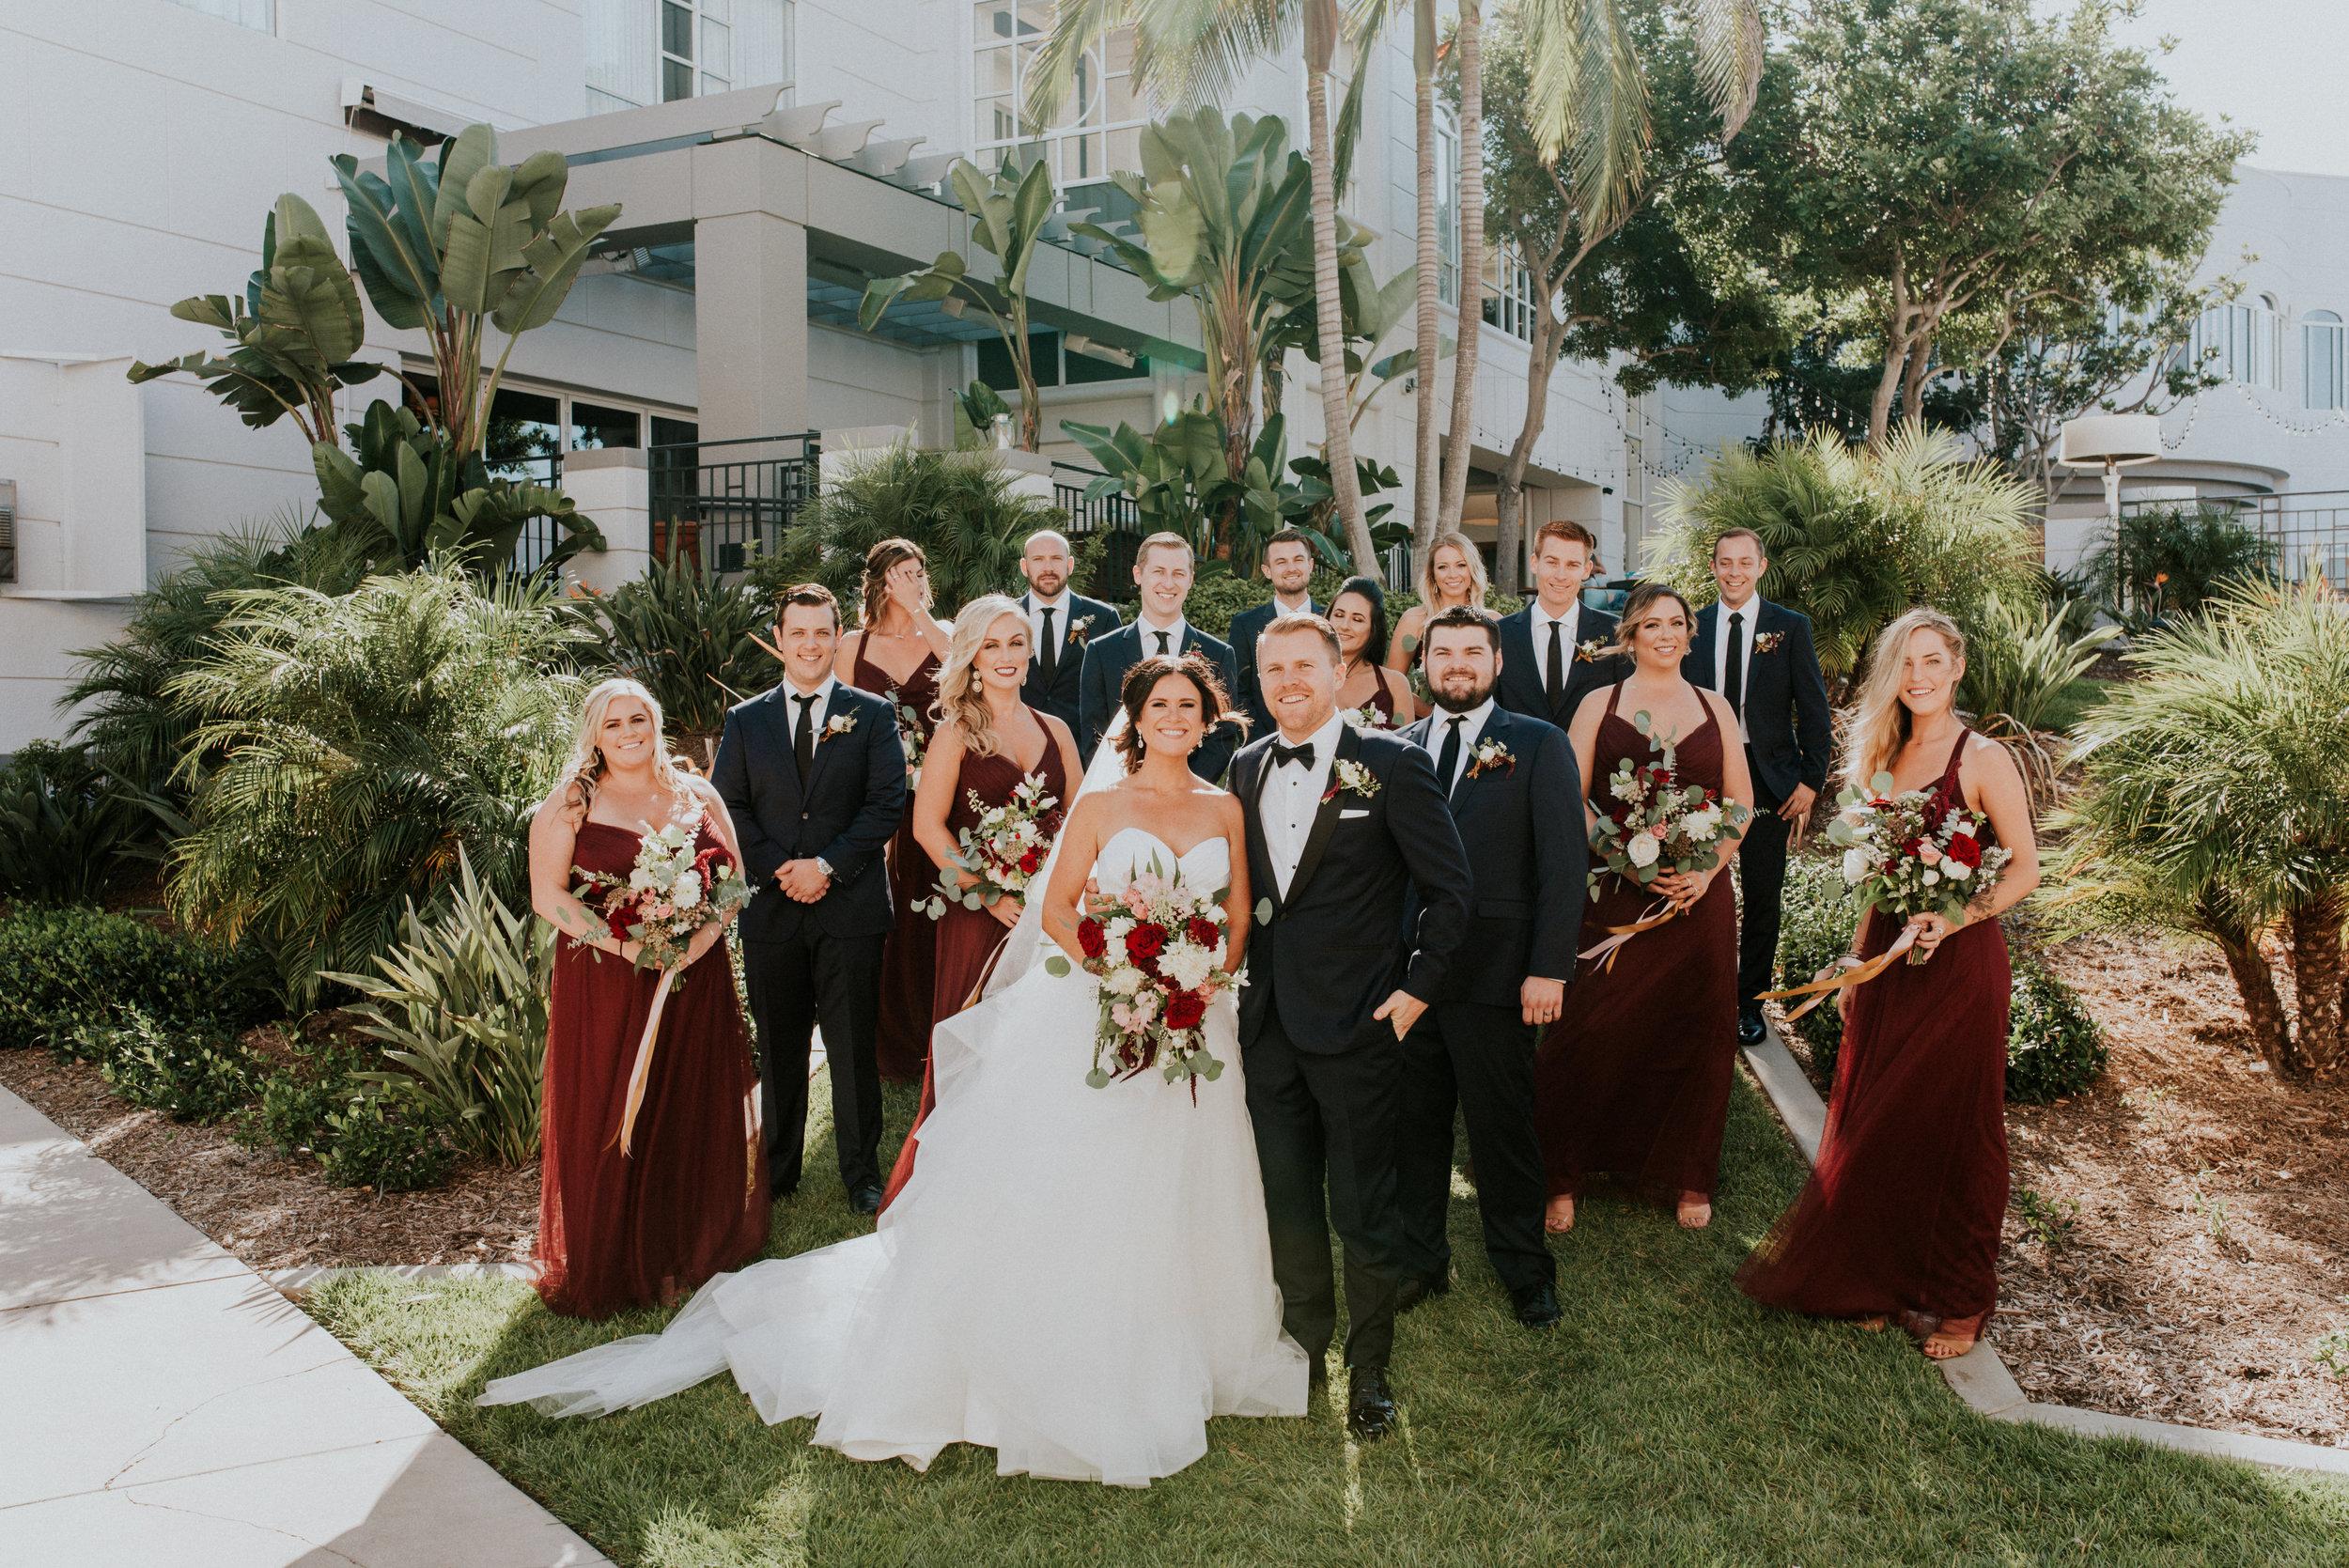 64720763_erik_and_kendall_navy_wedding_suits.jpg